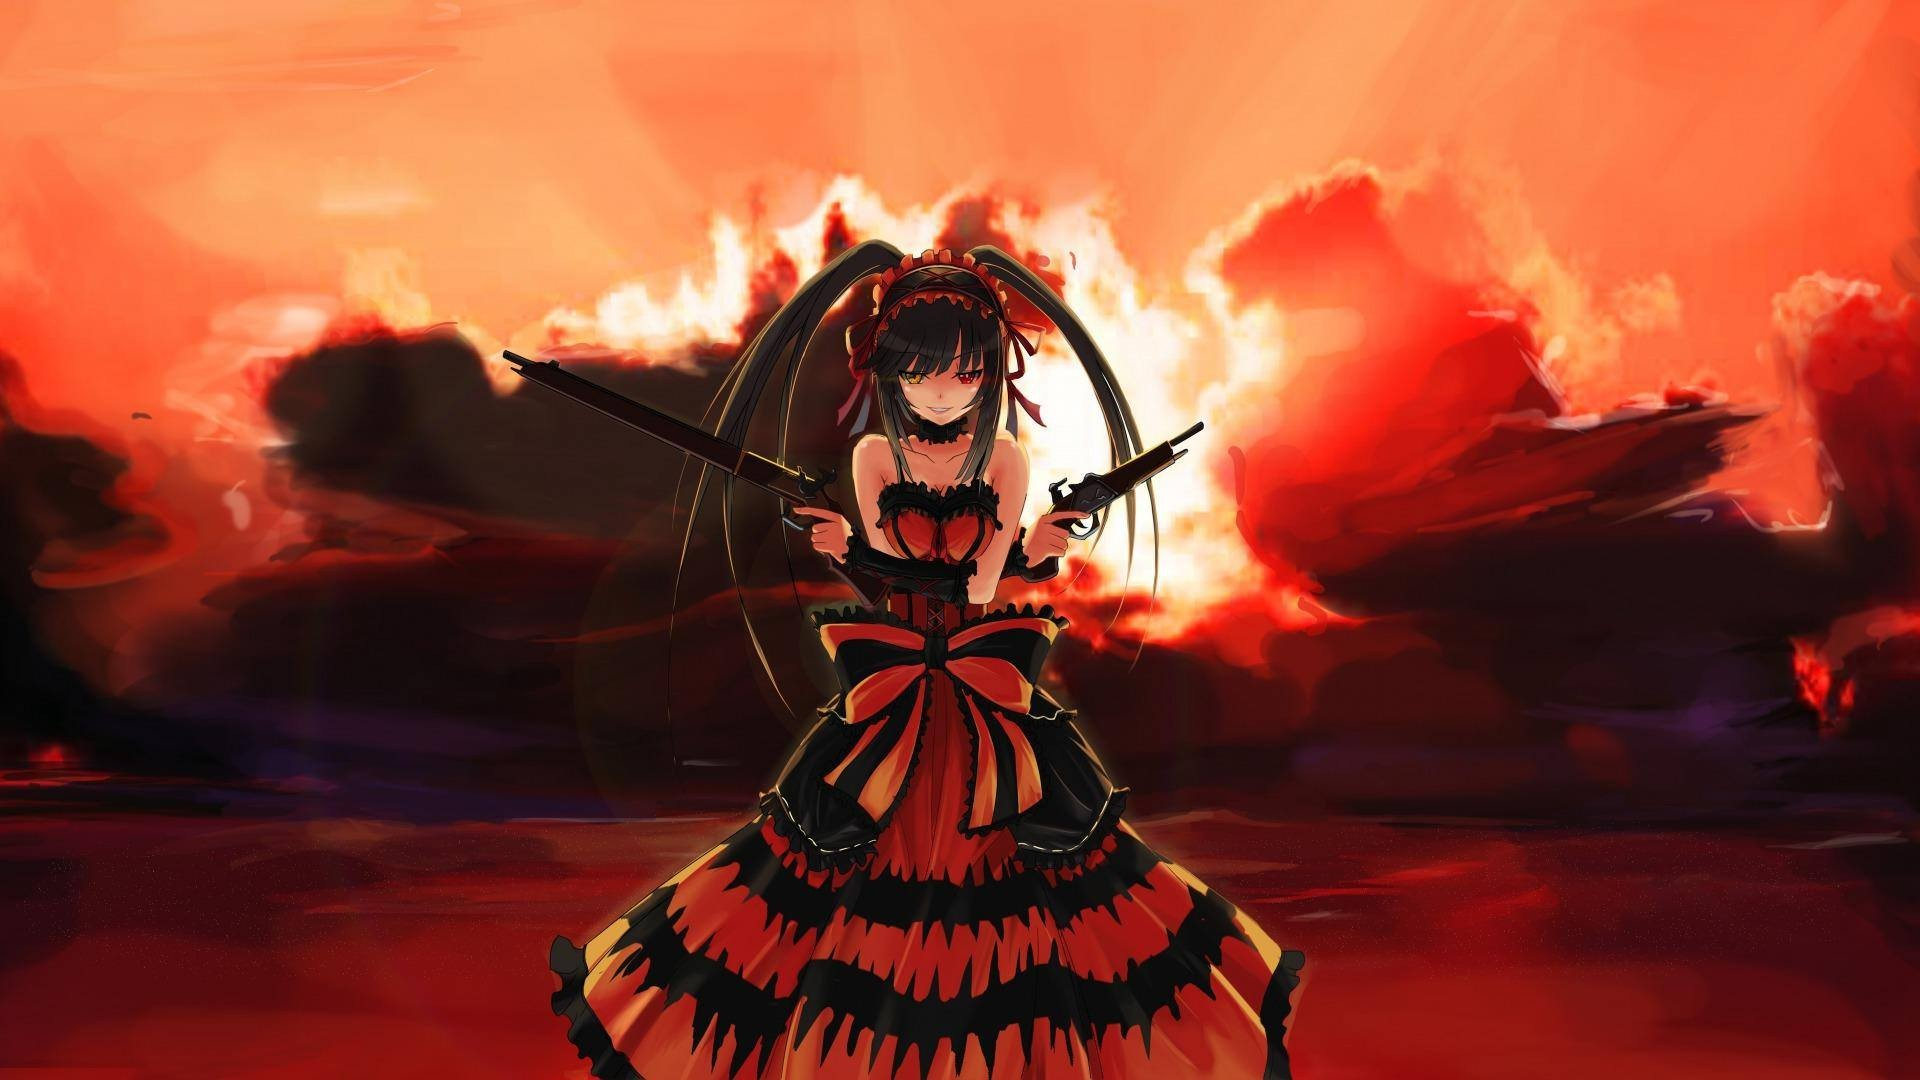 4524824 anime Tokisaki Kurumi Date A Live wallpaper Mocah 1920x1080